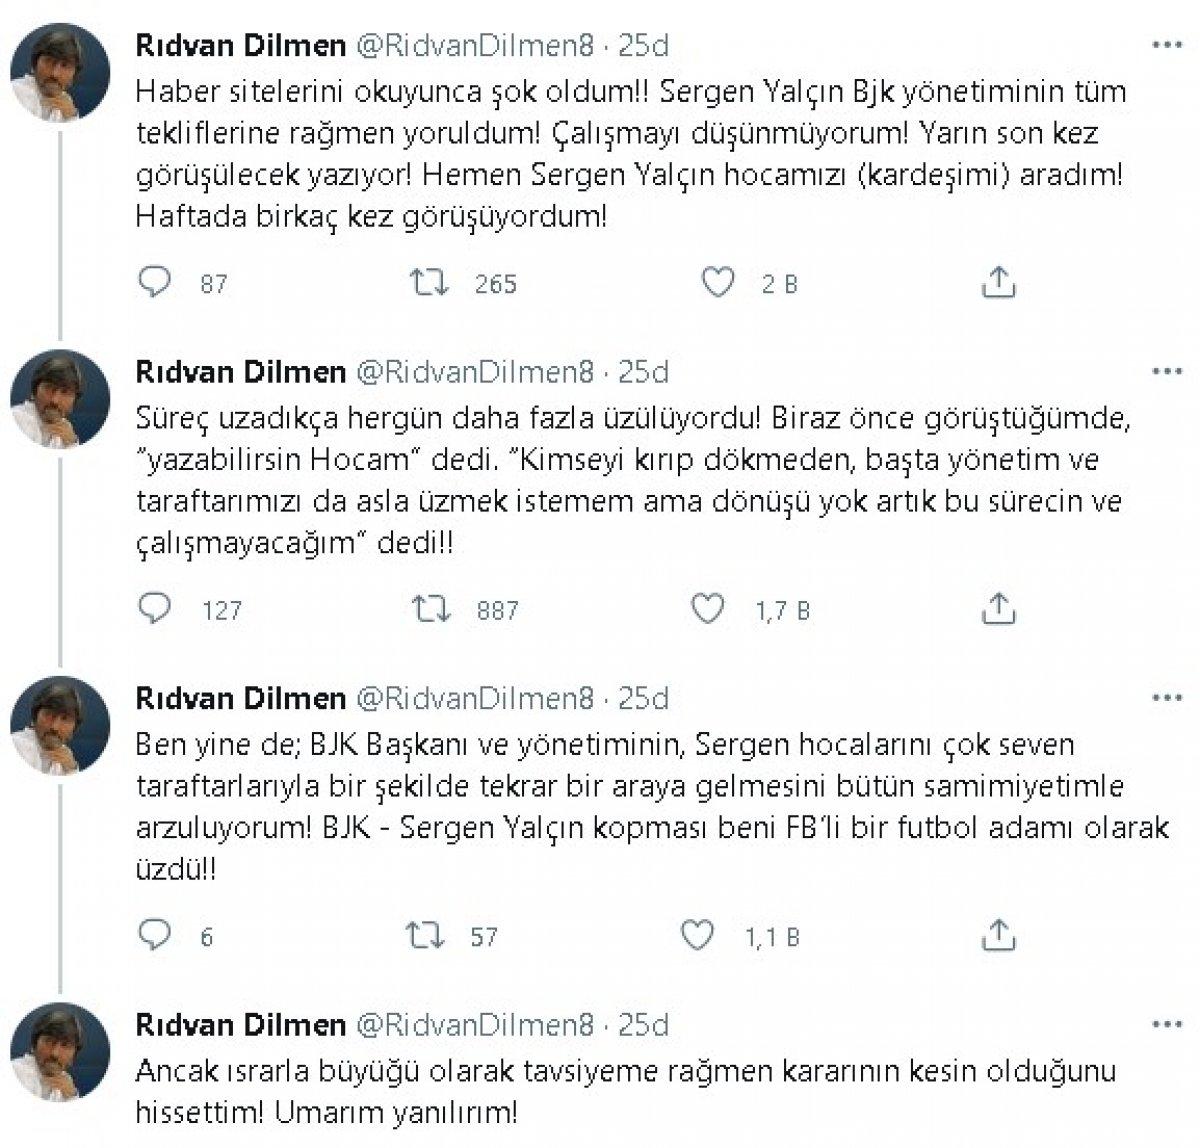 Rıdvan Dilmen: Sergen Yalçın Beşiktaş ı reddetti #3